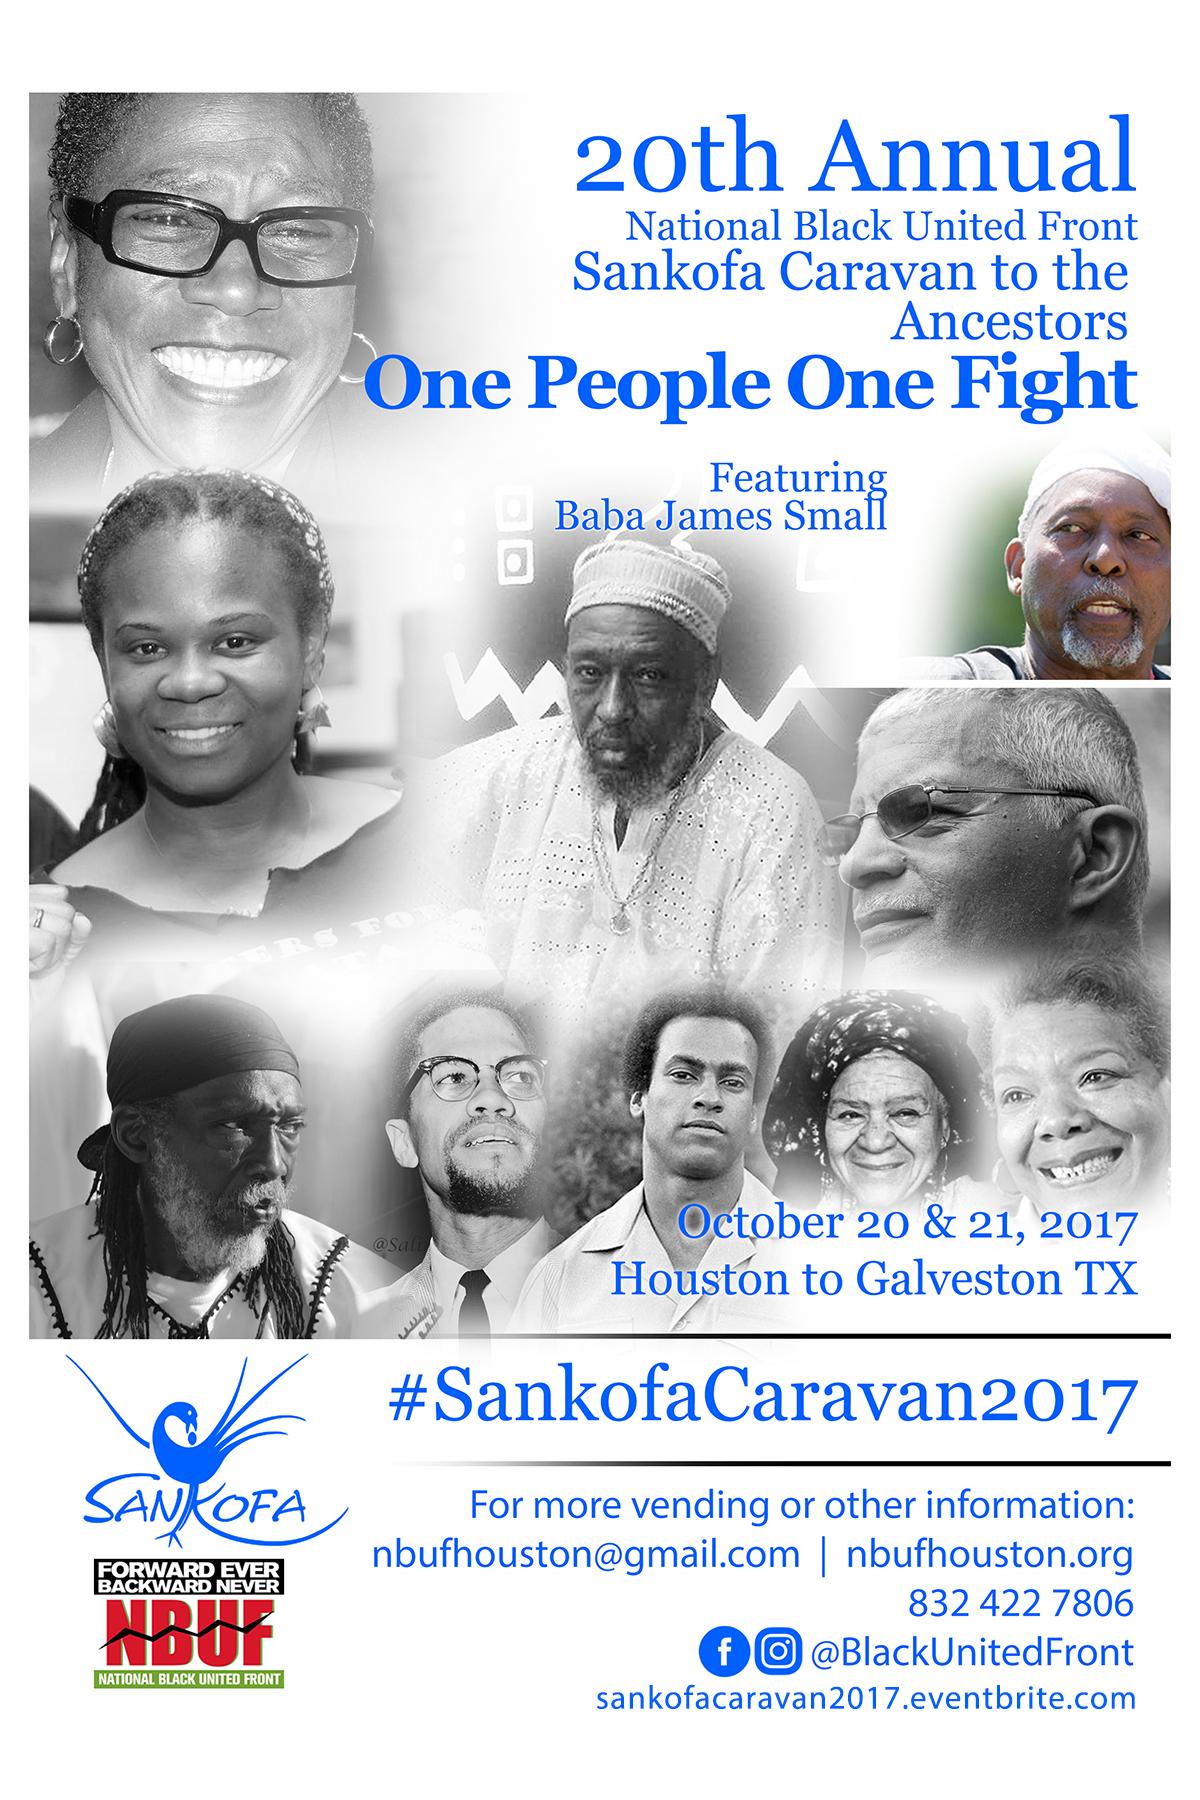 2017 NBUF Sankofa Caravan